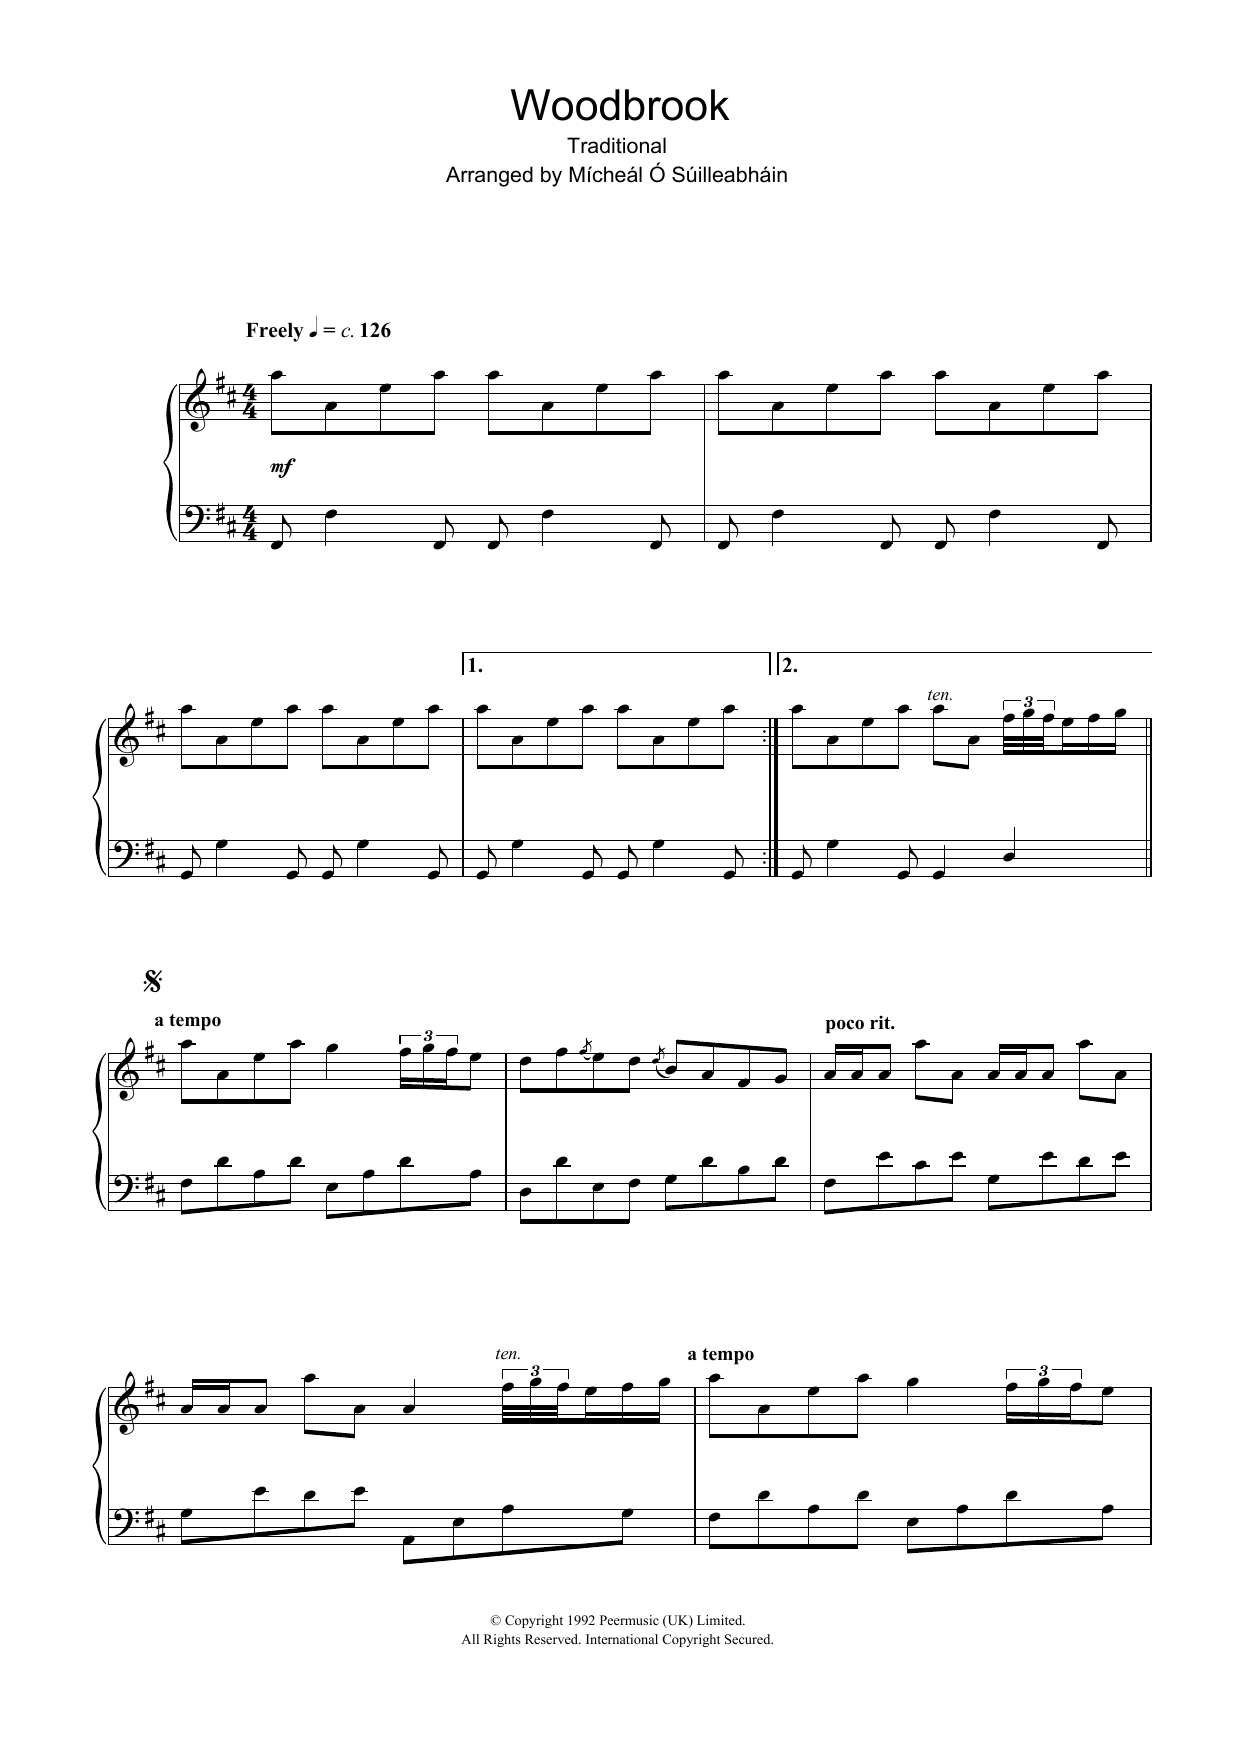 Woodbrook sheet music